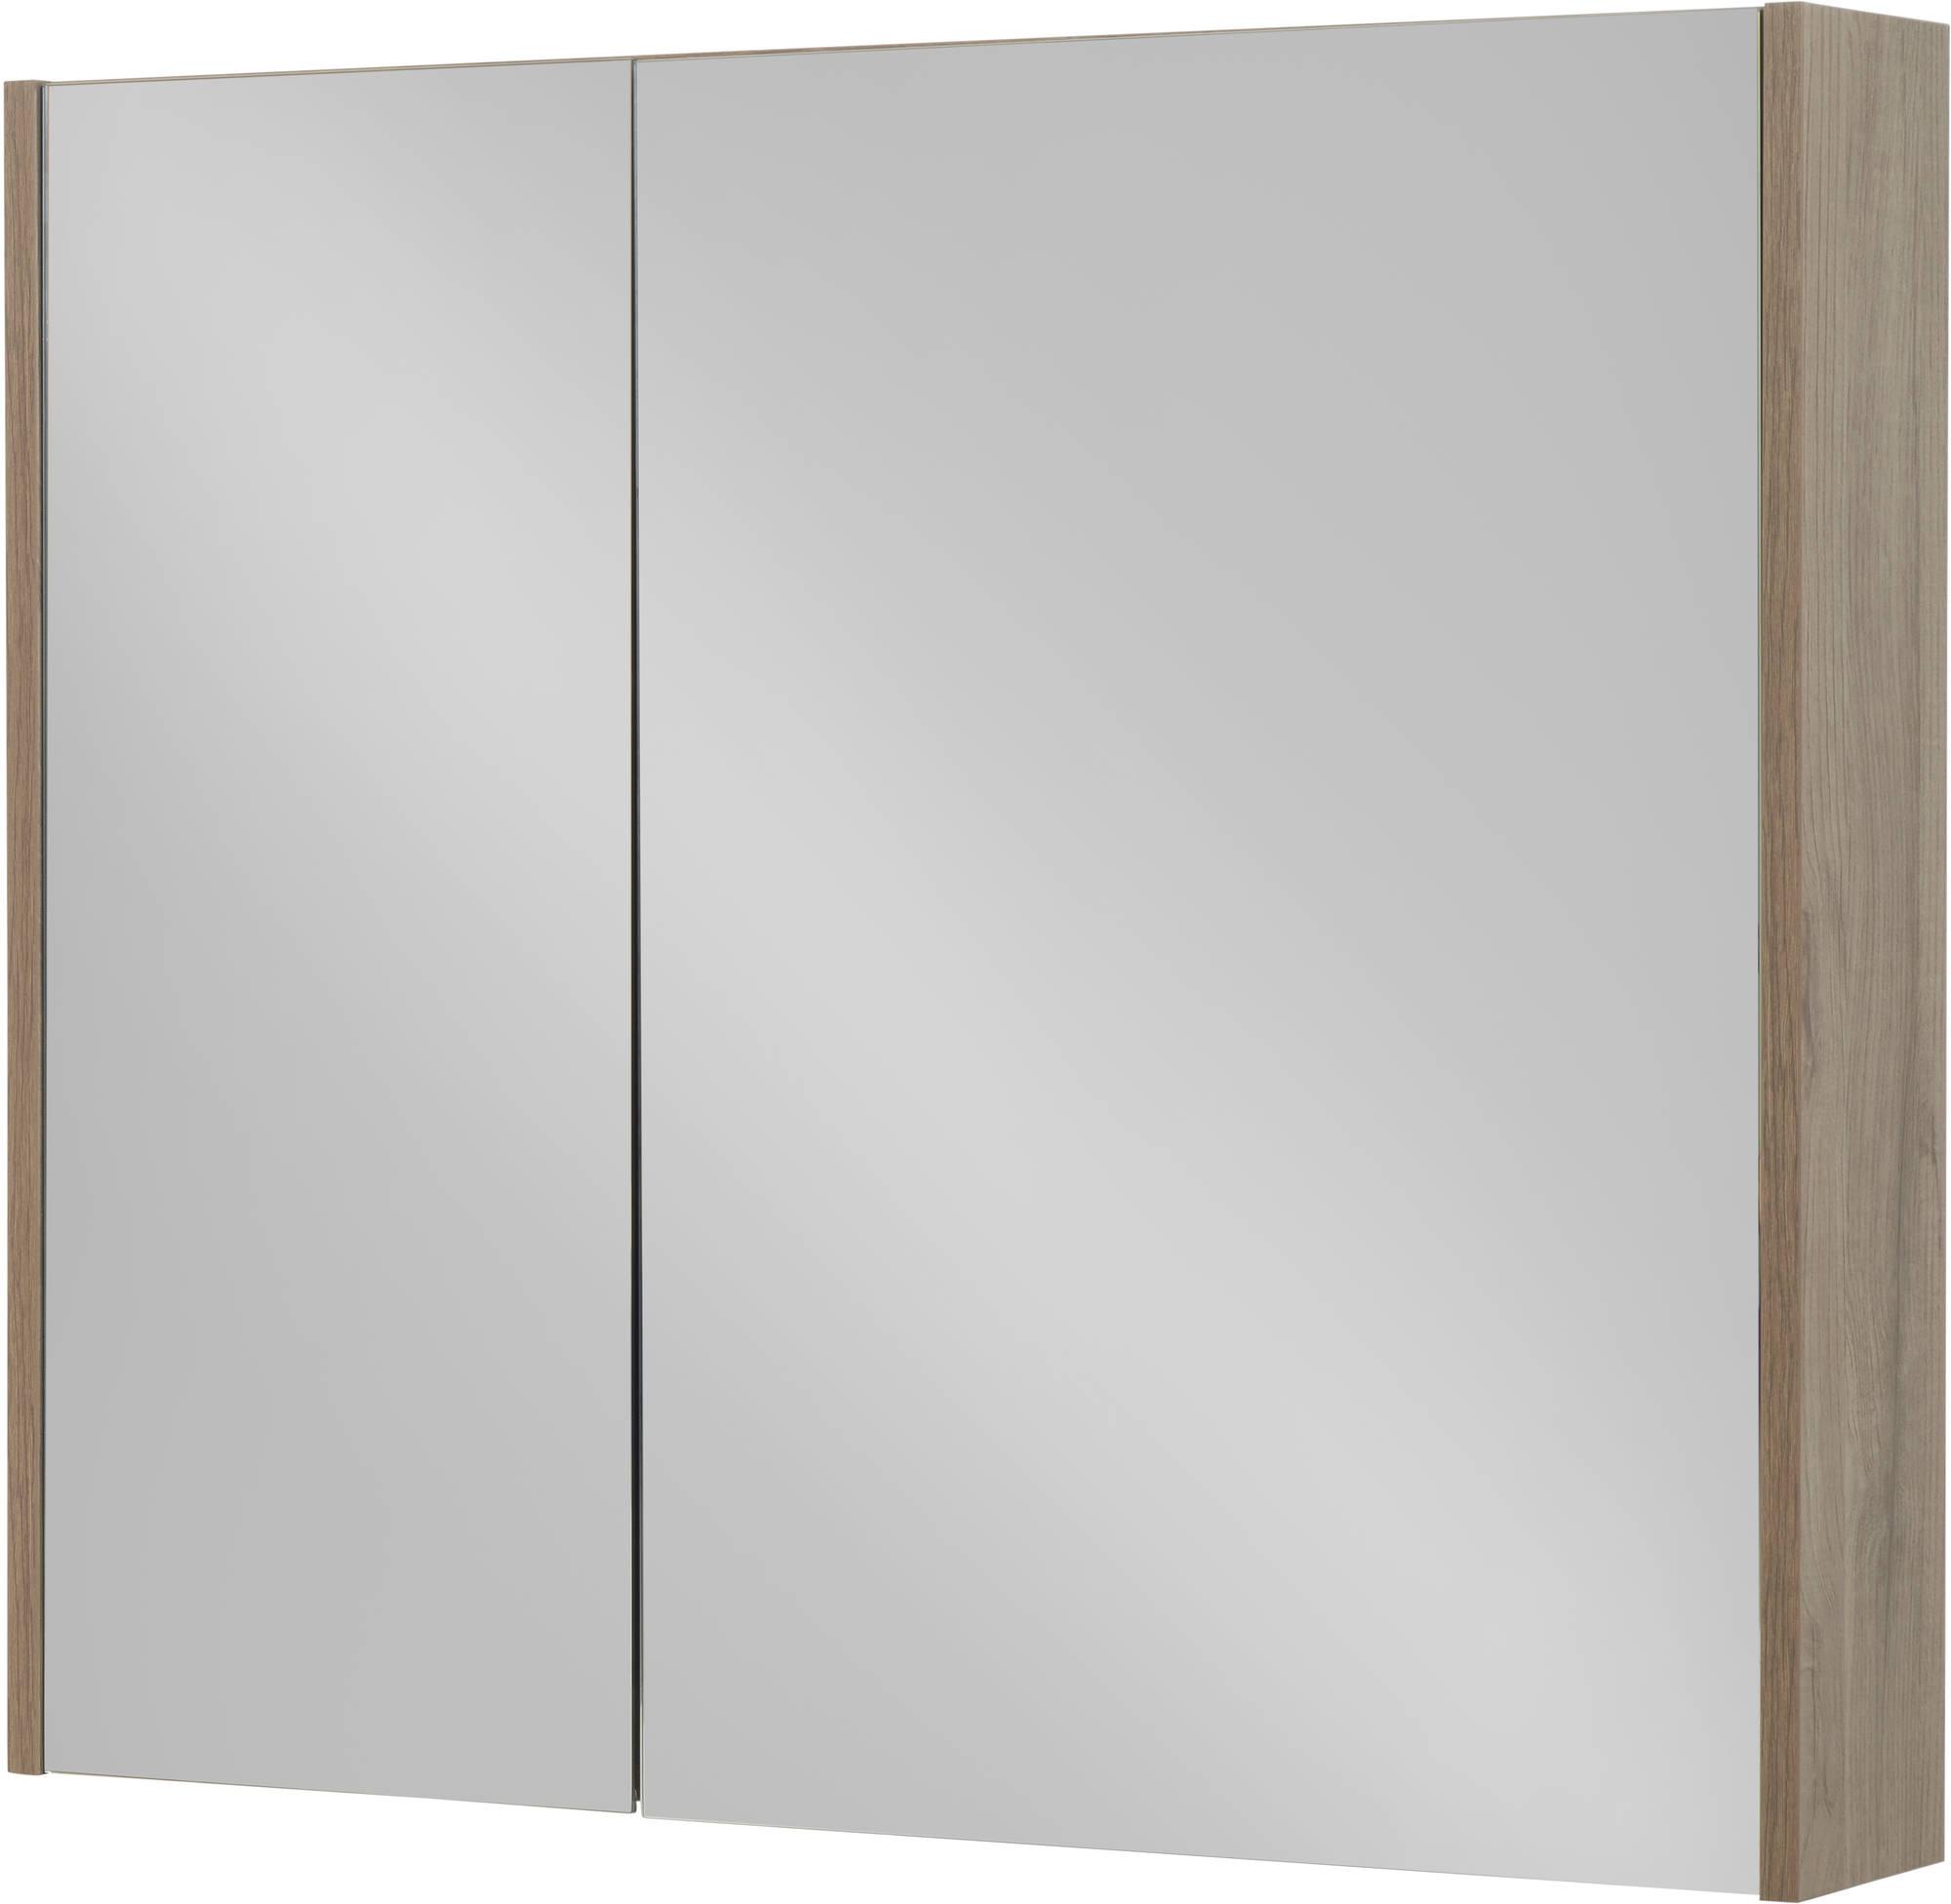 Saniselect Socan Spiegelkast 80x14x70 cm Toffee